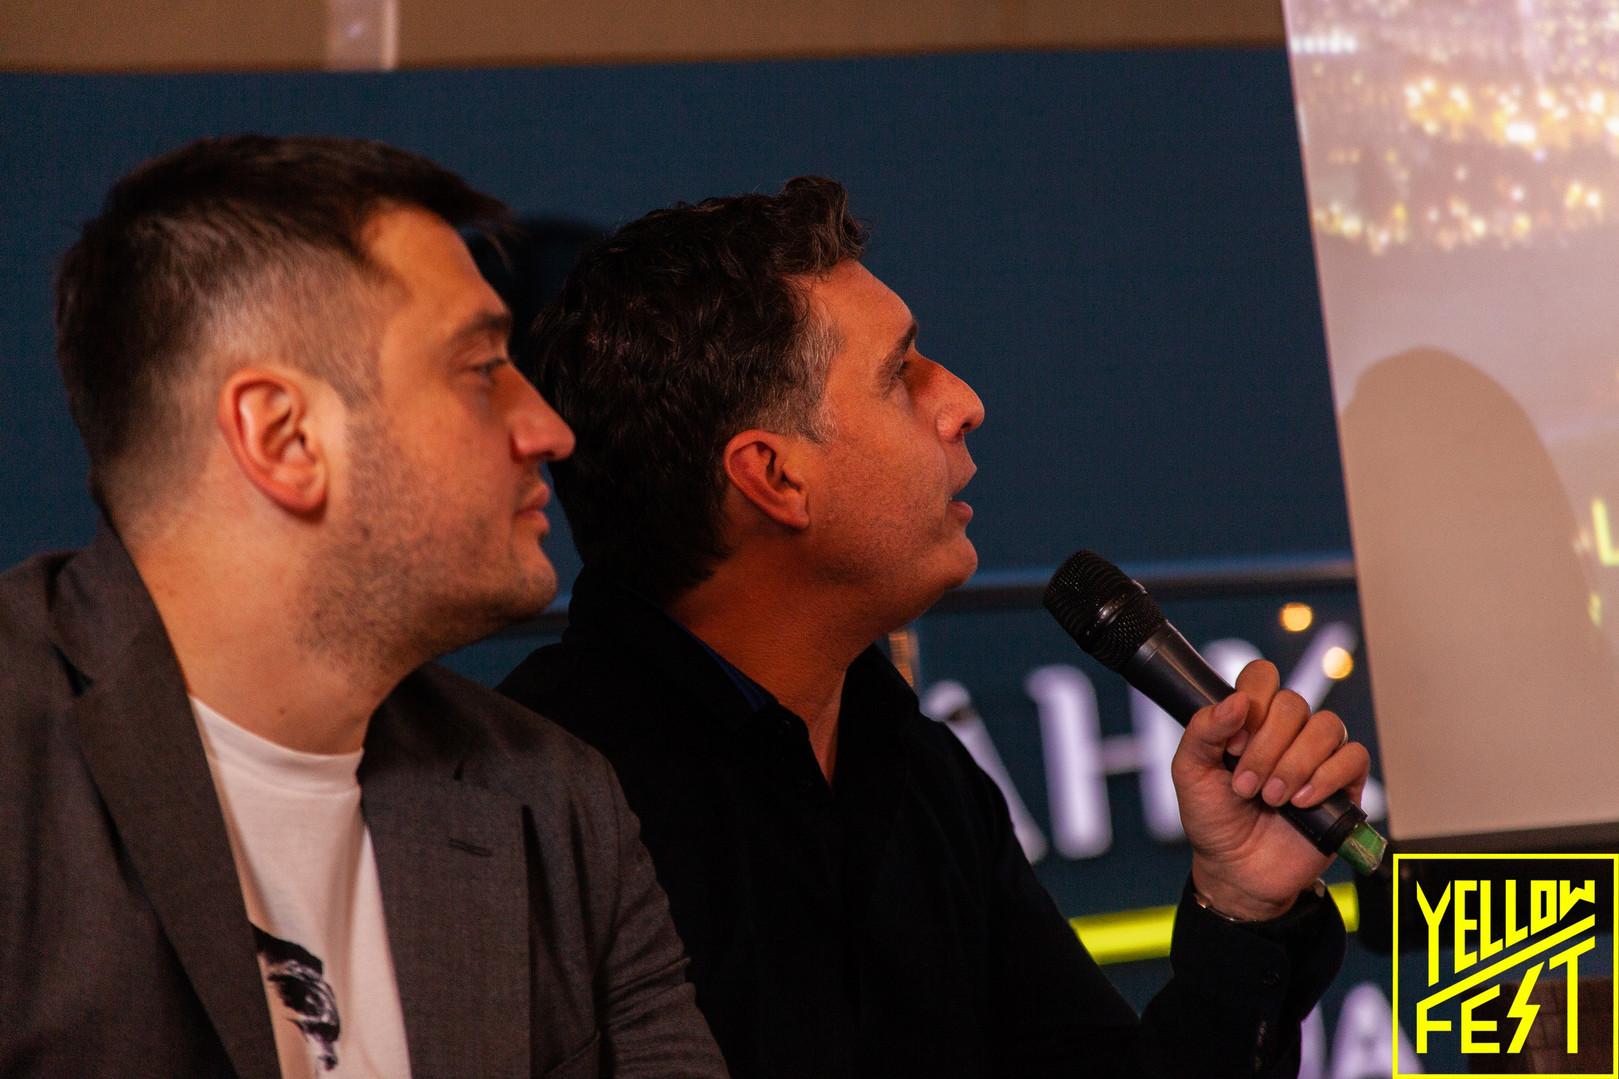 Alexander Bornyakov and Dominique Piotet at Yellow Fest Zero Panel Discussion